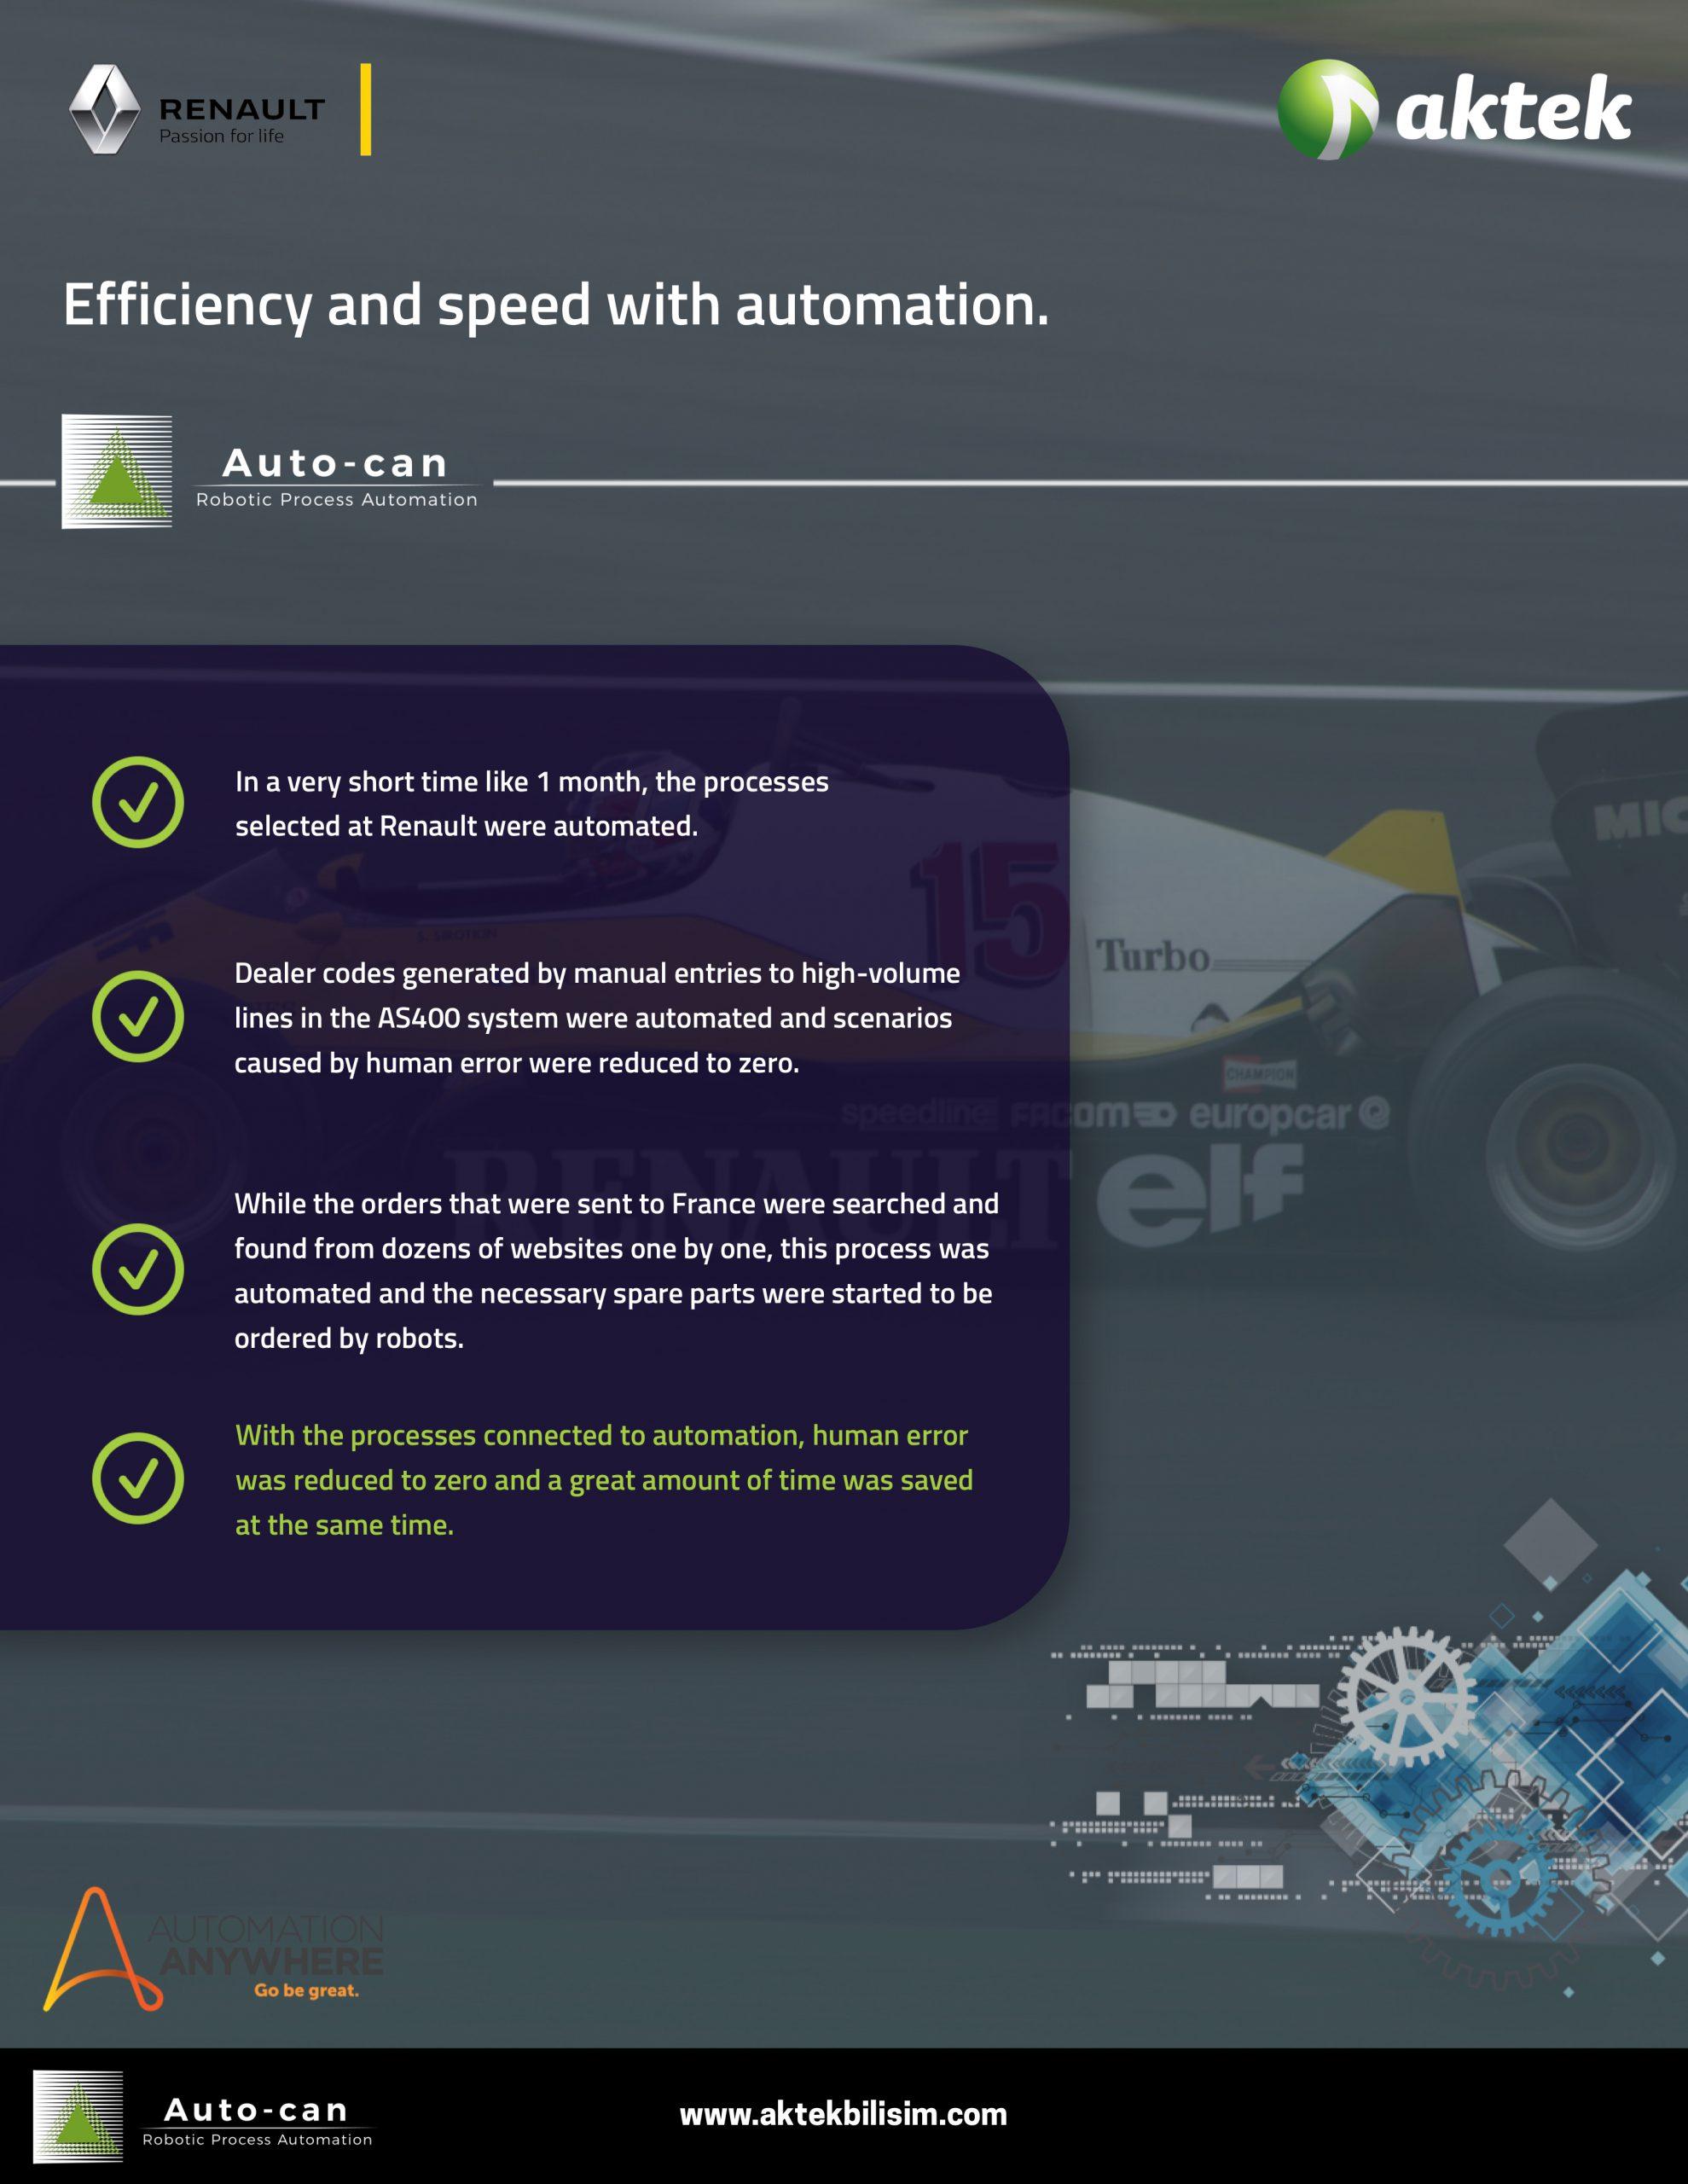 Aktek Autocan RPA & Renault Başarı Hikayesi